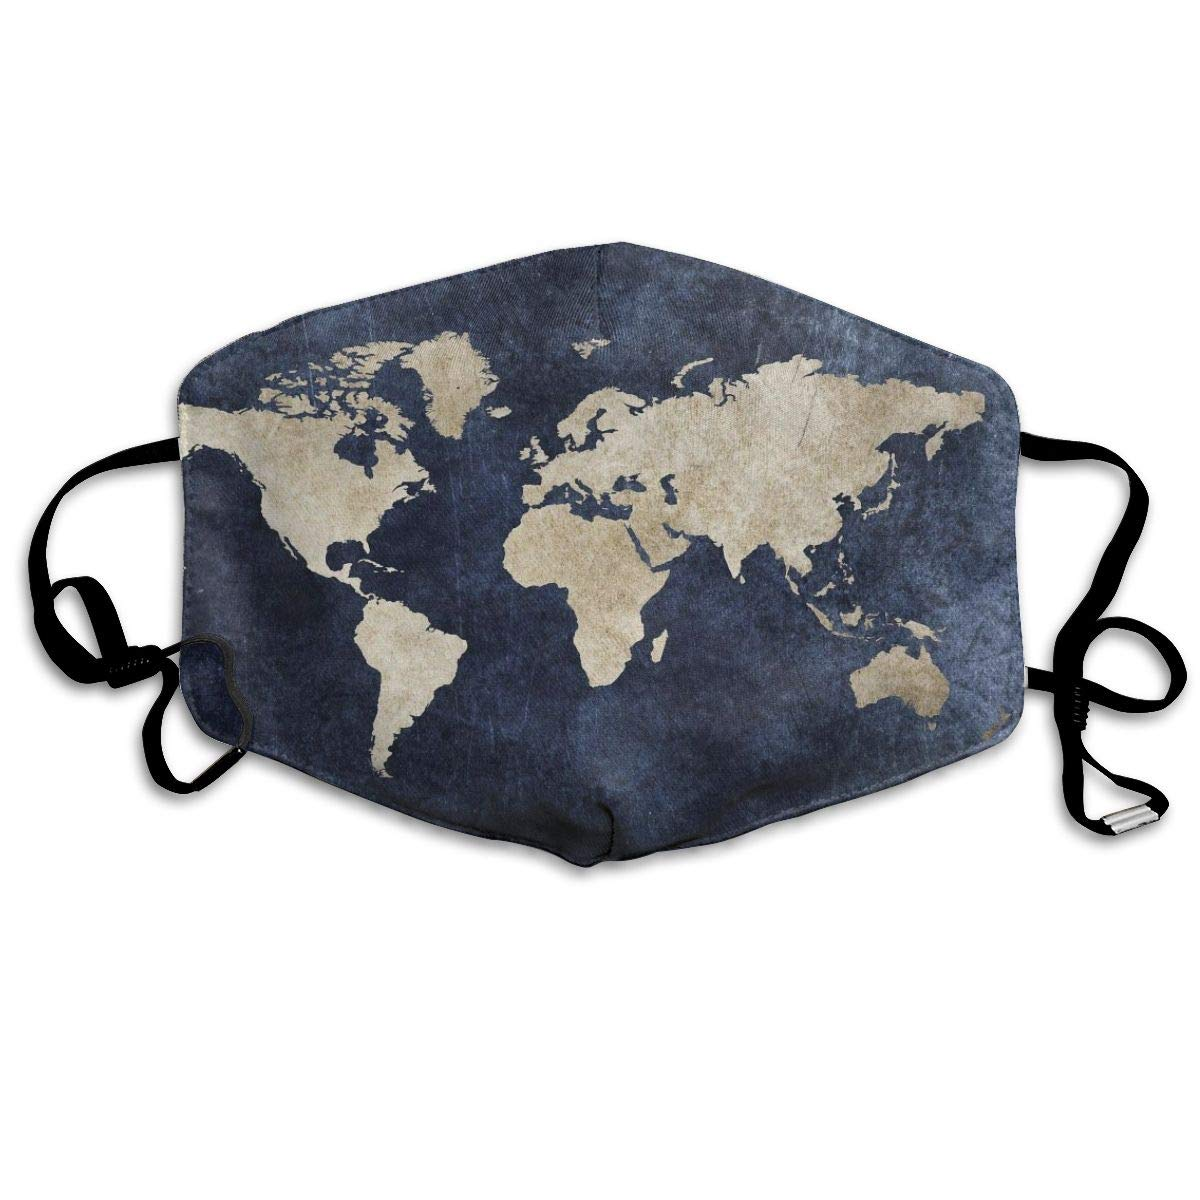 Premium Dust Mask - Washable Breathable Mouth Face Mask - Adjustable Ear Loop For Kids Women Men Earth World Map Art